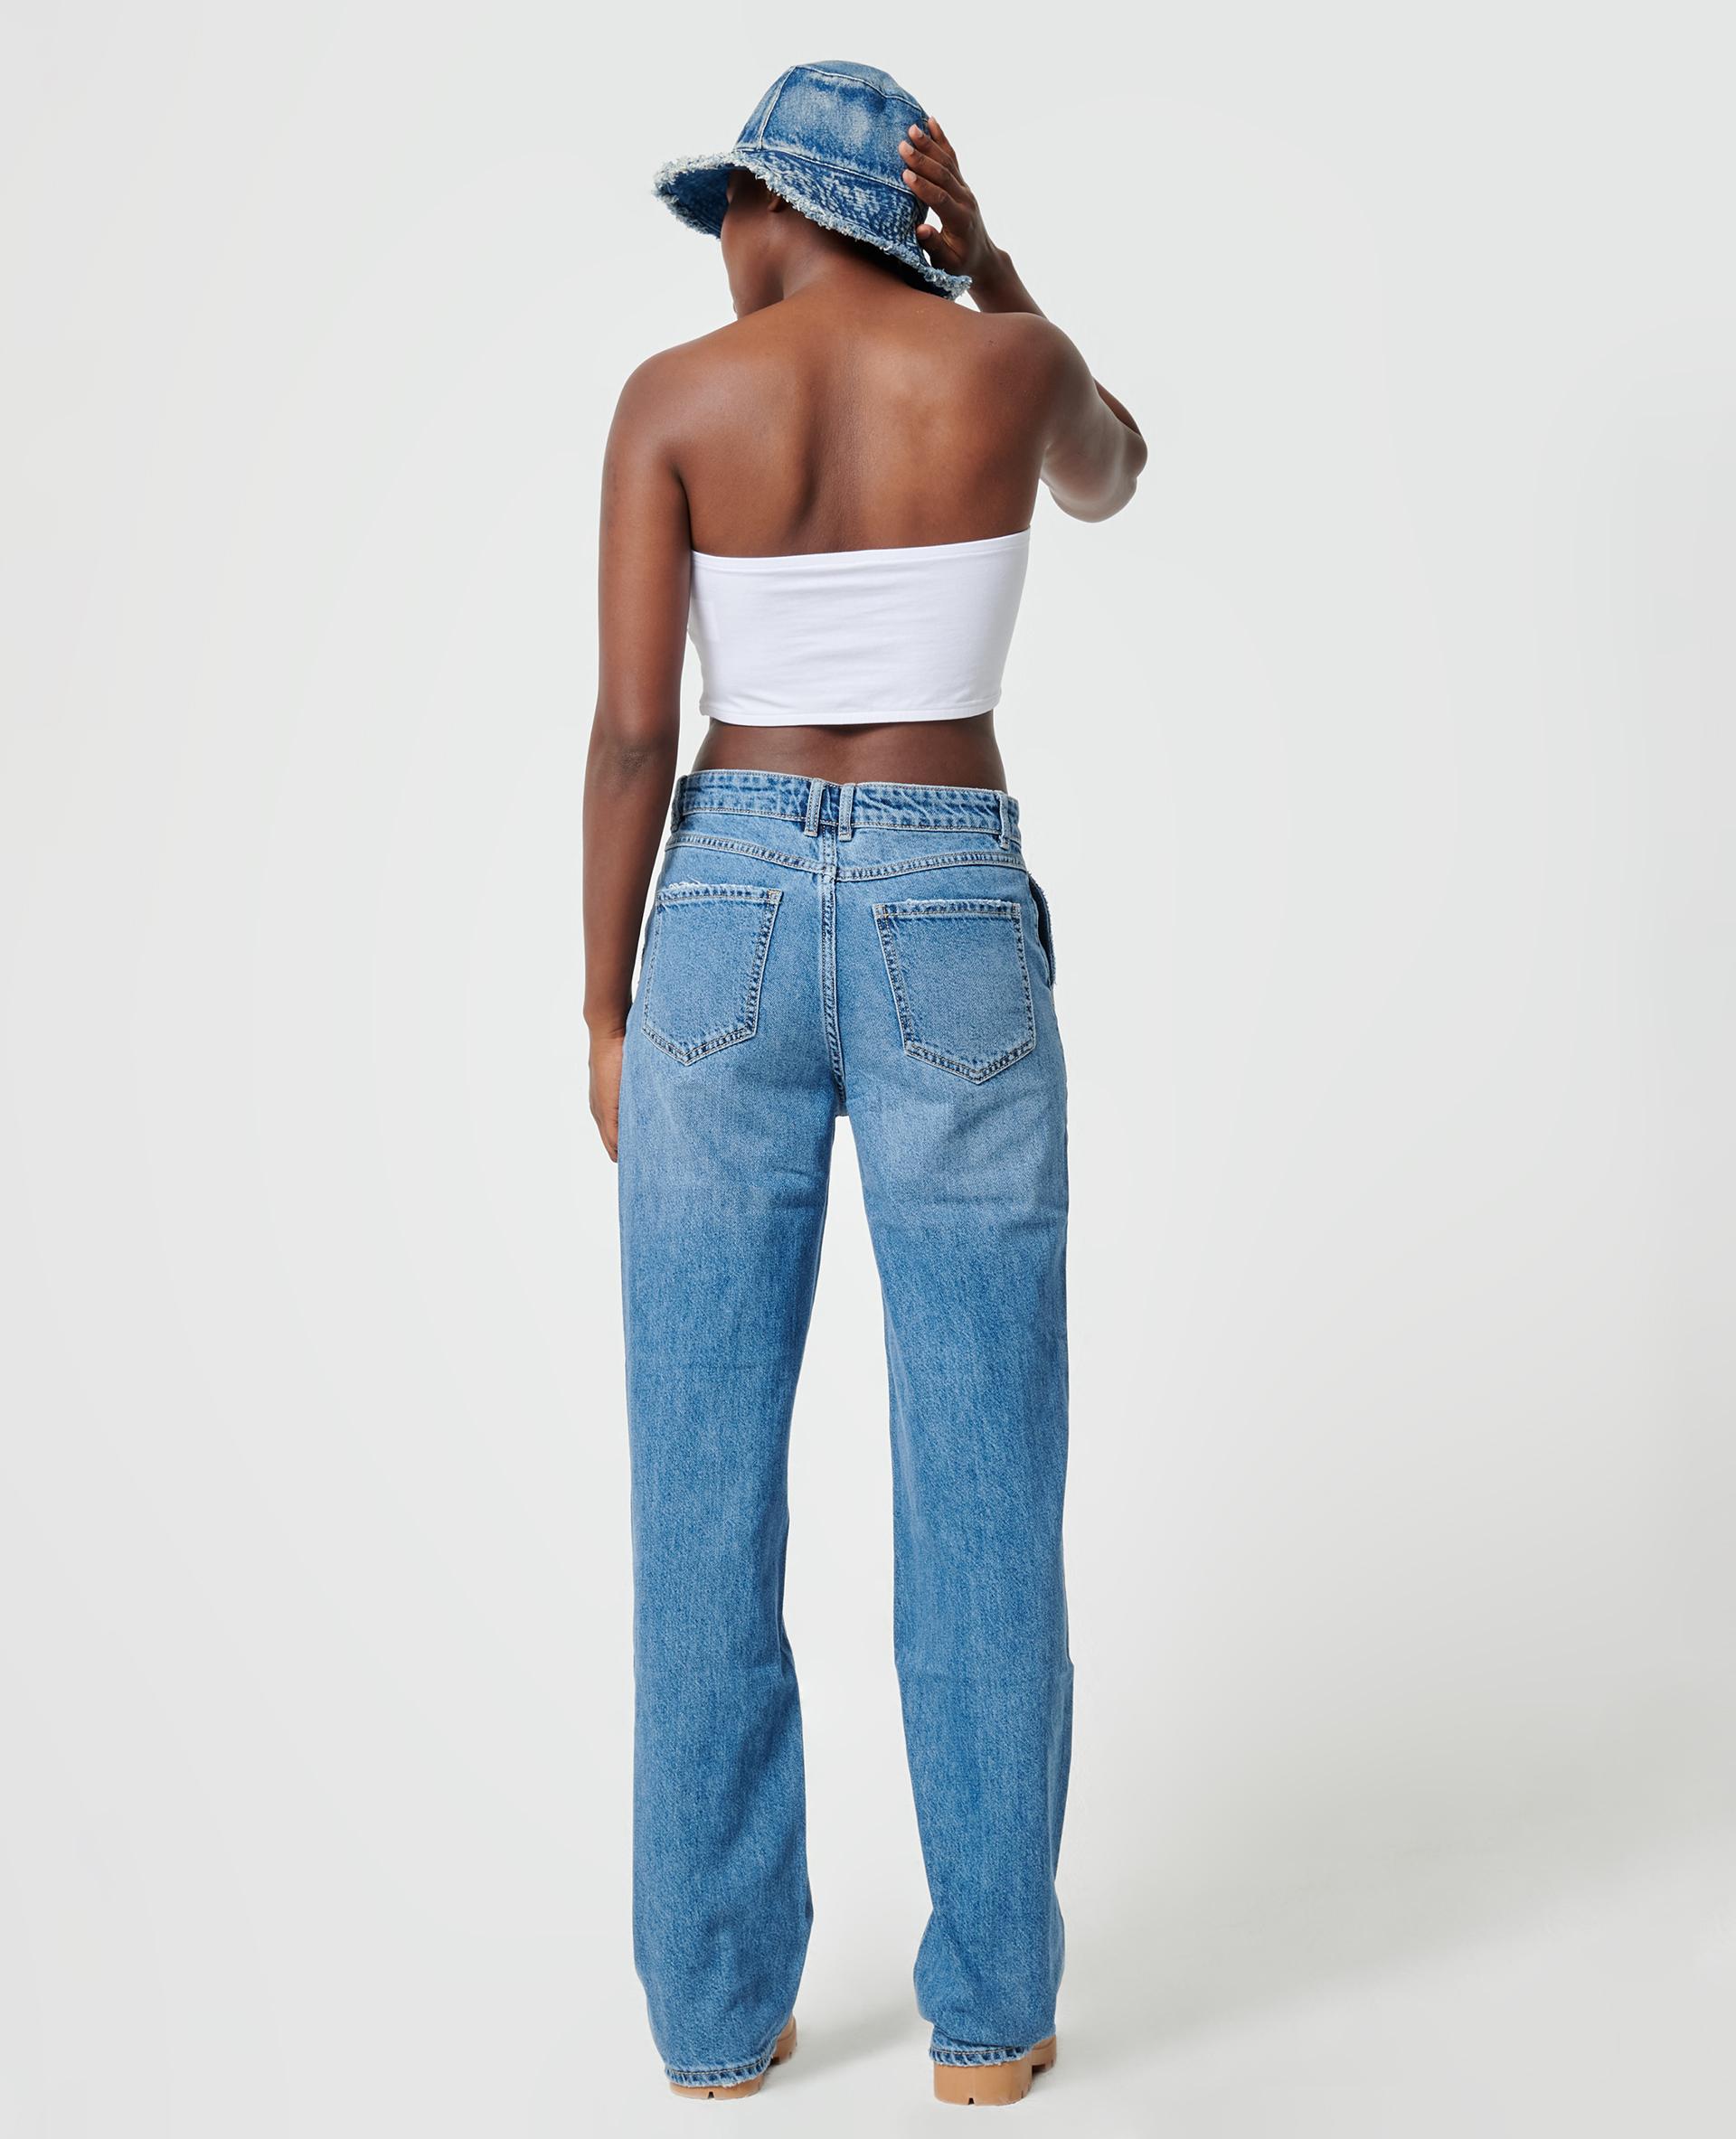 Jean baggy taille basse bleu denim - Pimkie